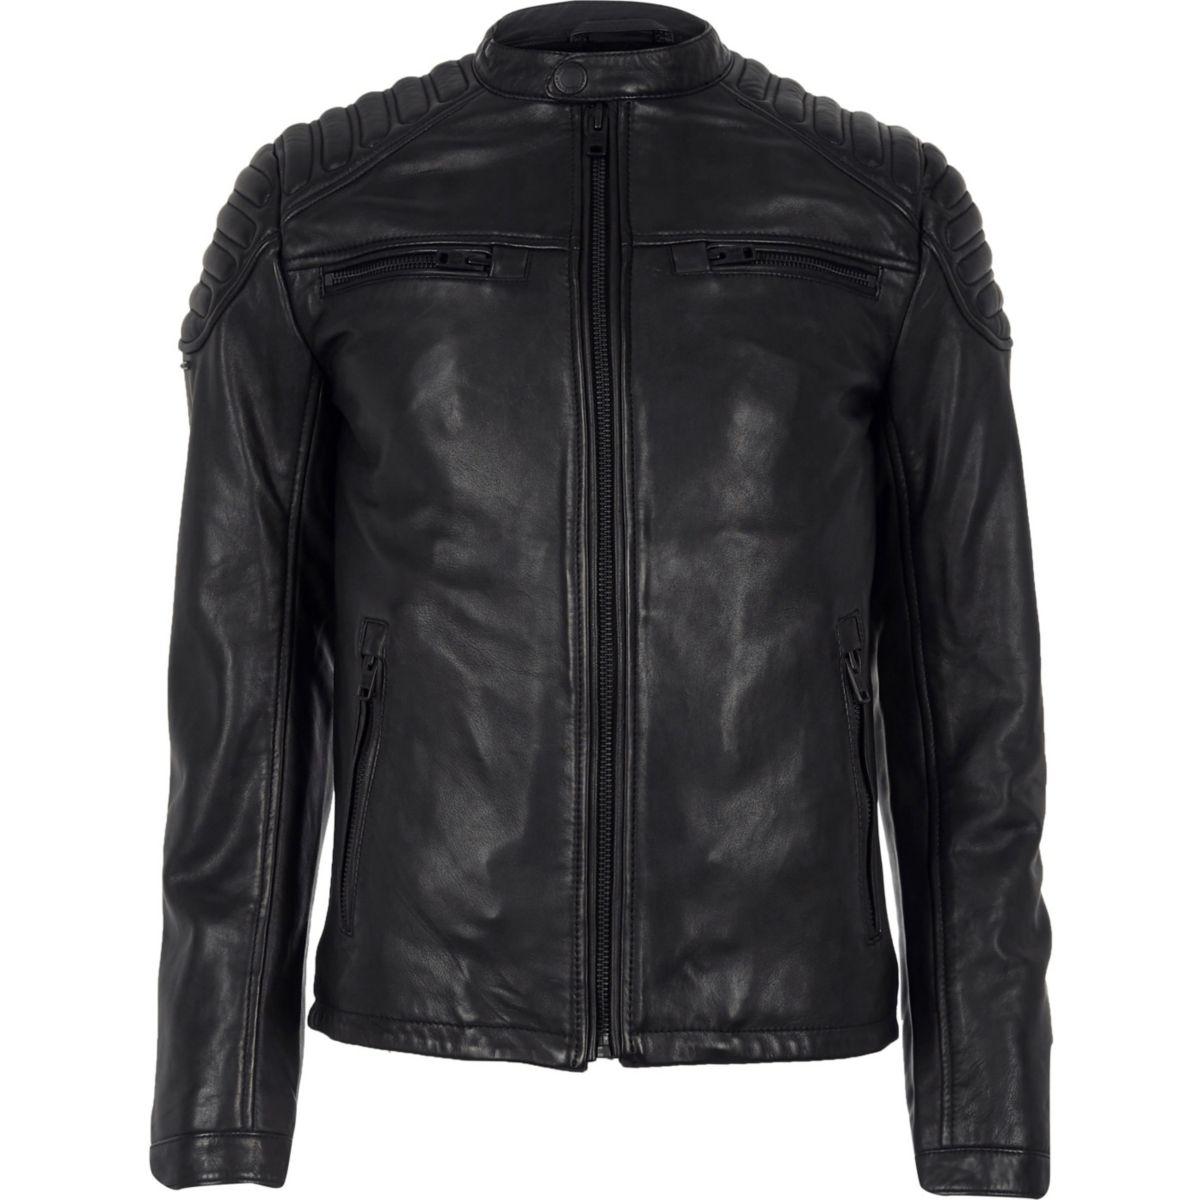 leather Superdry leather black racer jacket Superdry Superdry jacket black racer 1TdB4q